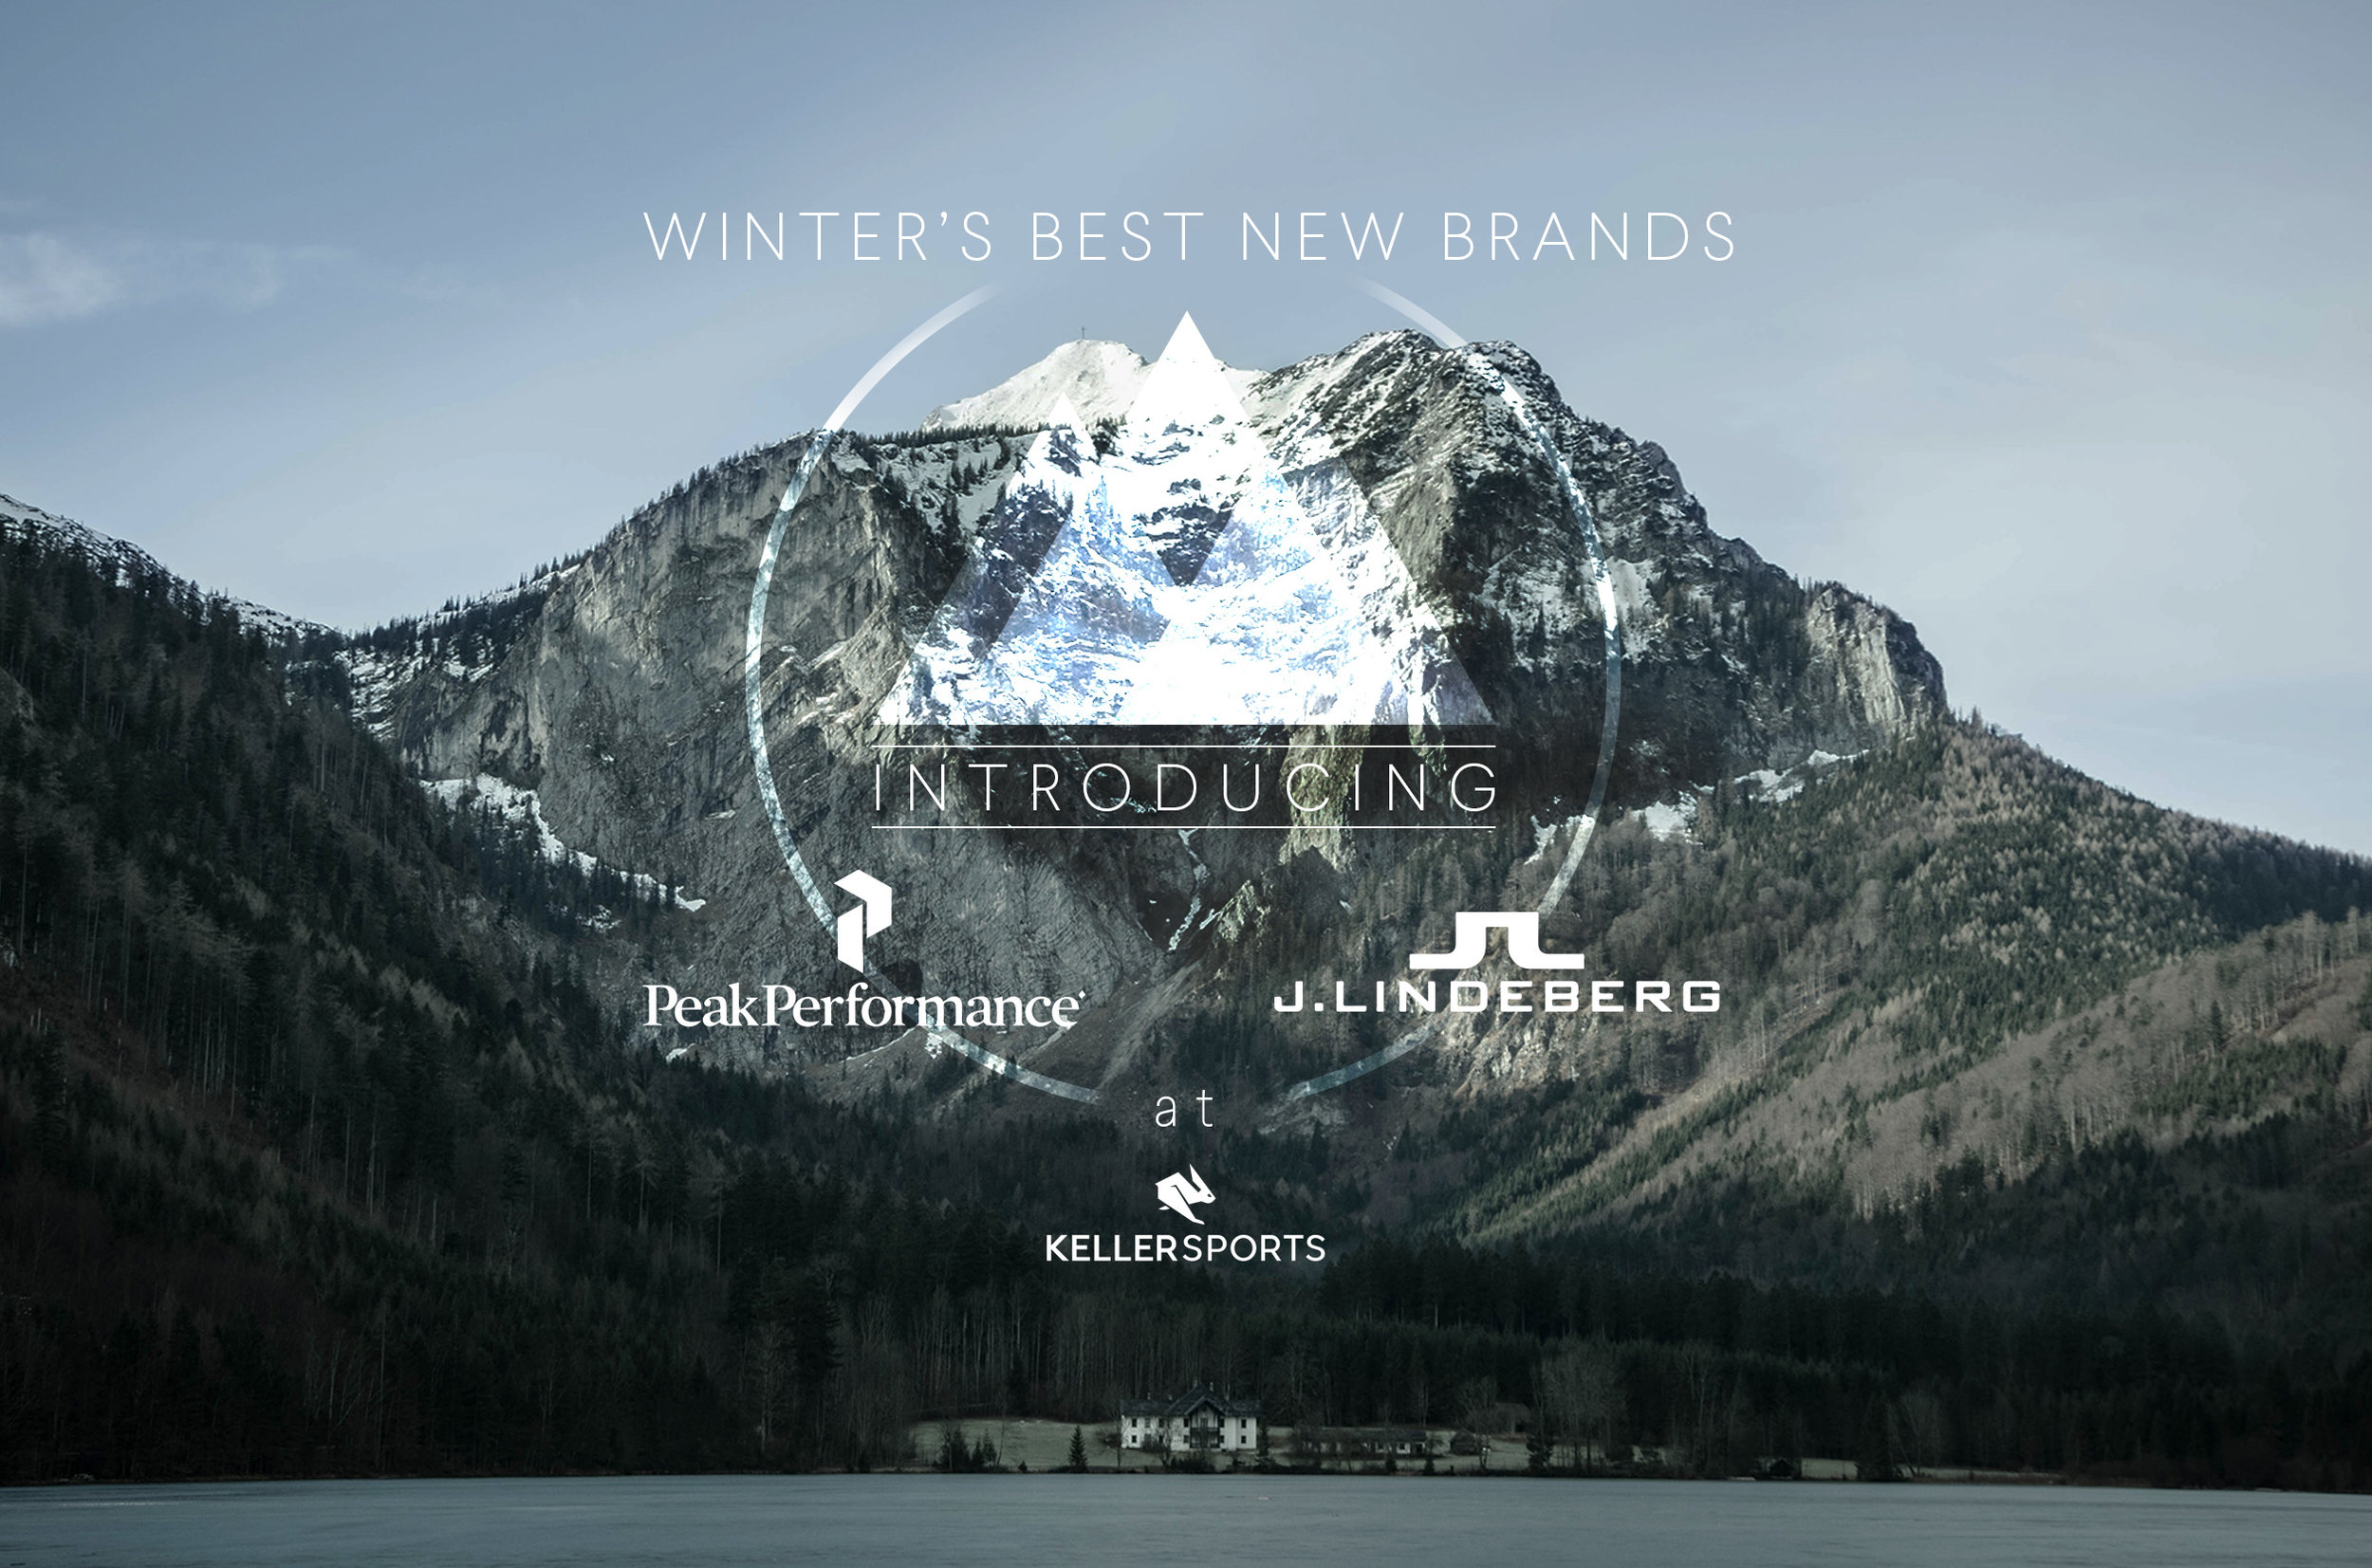 Jlindeberg-PeakPerformance-Poster.jpg